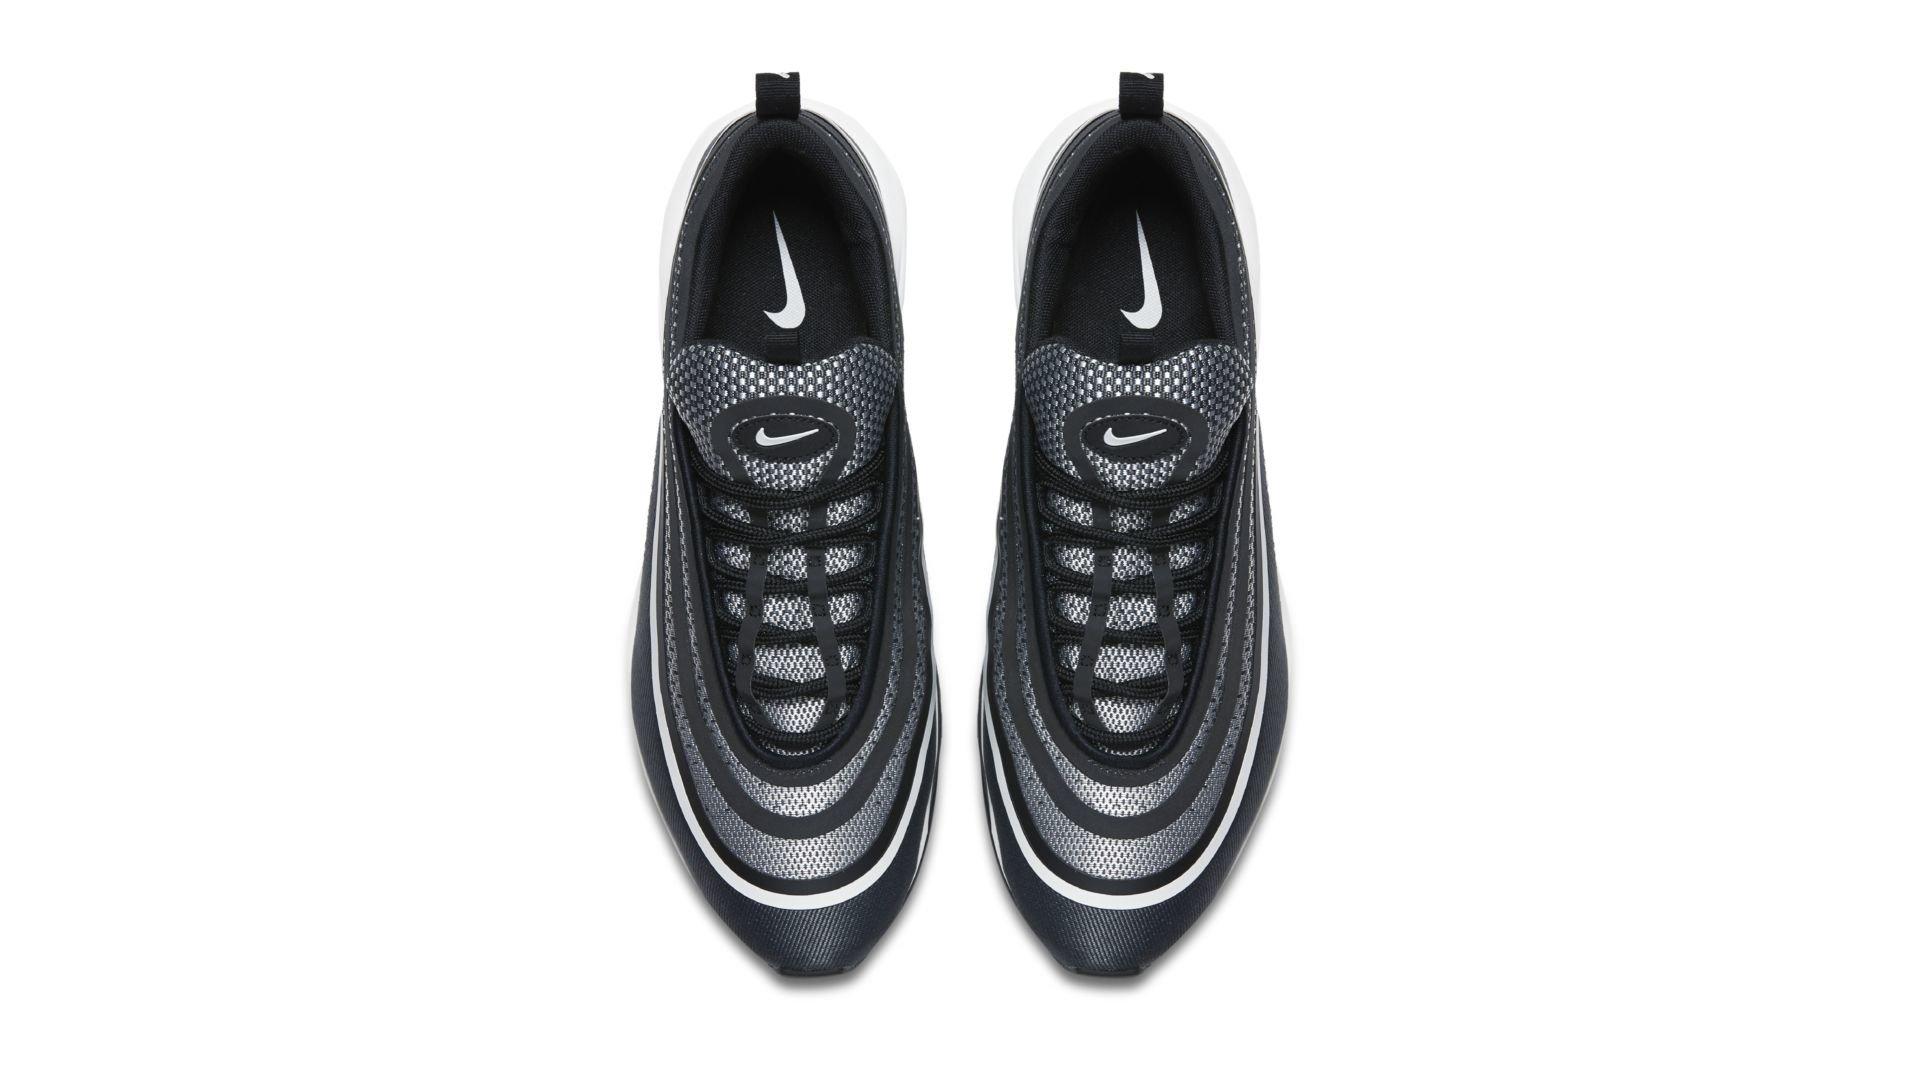 Nike Air Max 97 Ultra 17 Black White (918356-001)